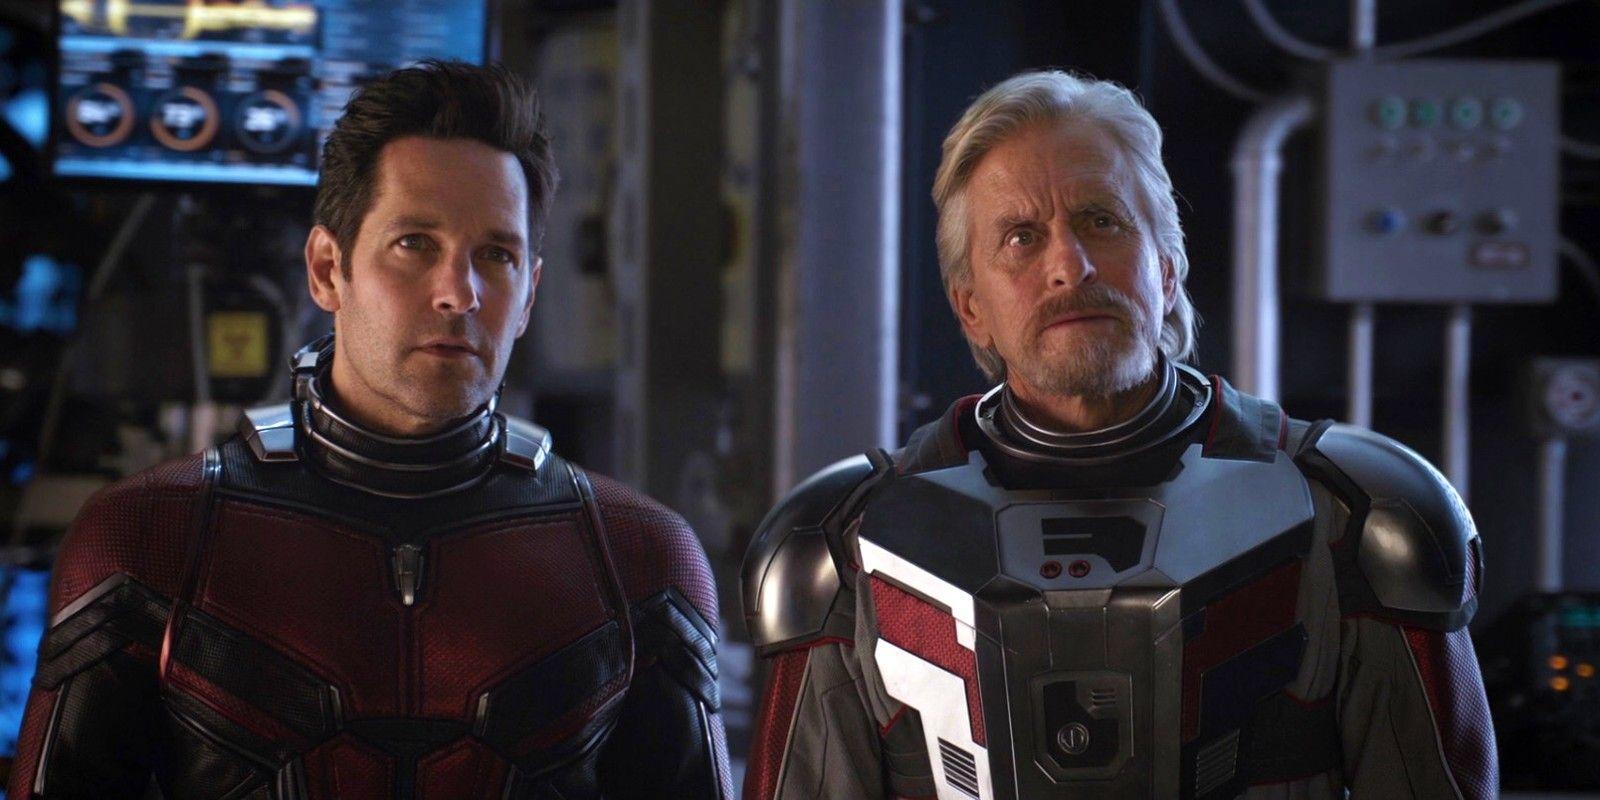 Ant-Man 3 Director Hypes Up Marvel Film On Michael Douglas' Birthday